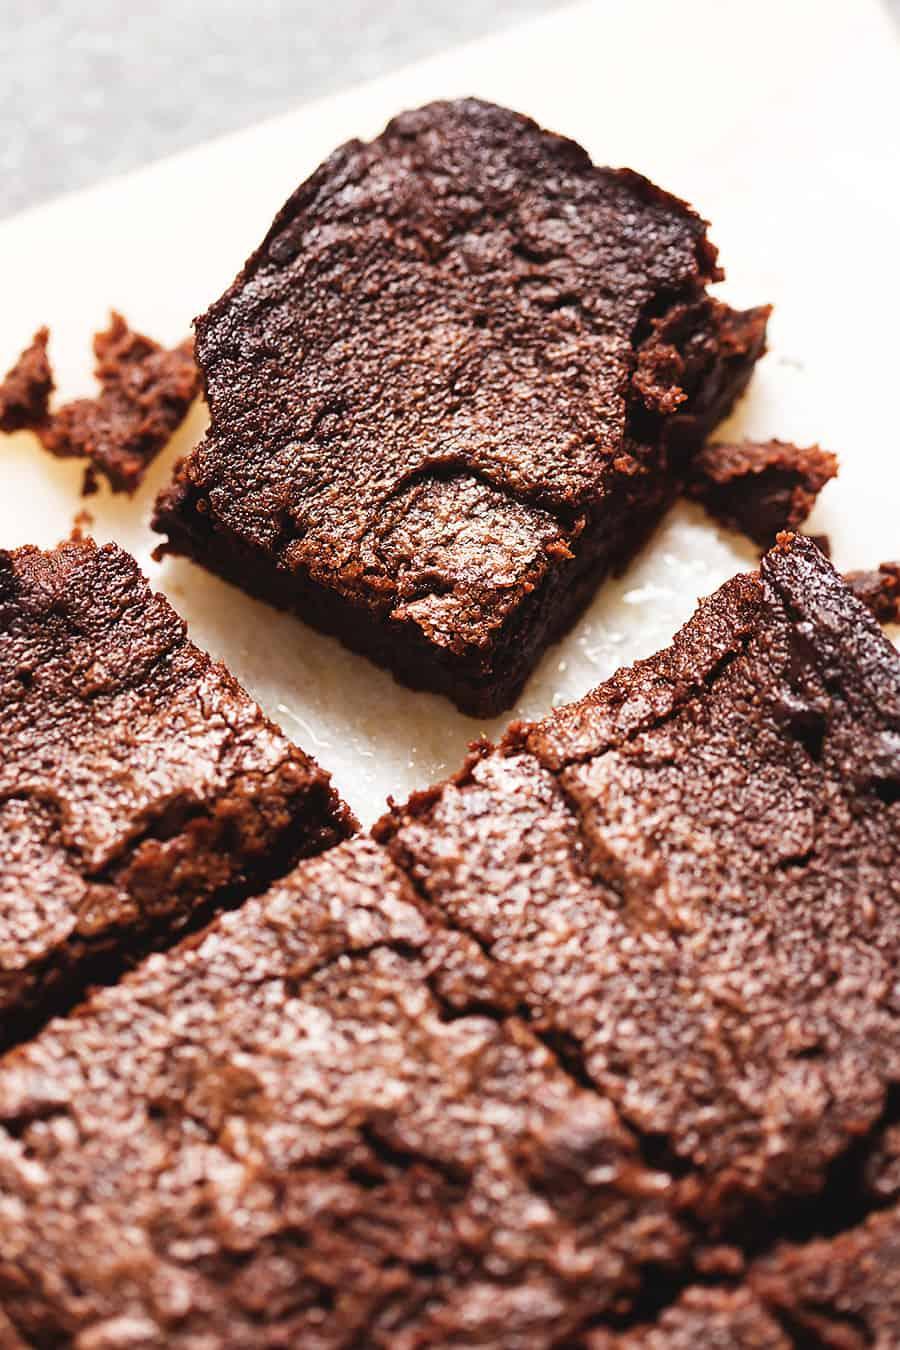 Baking sheet with keto brownies